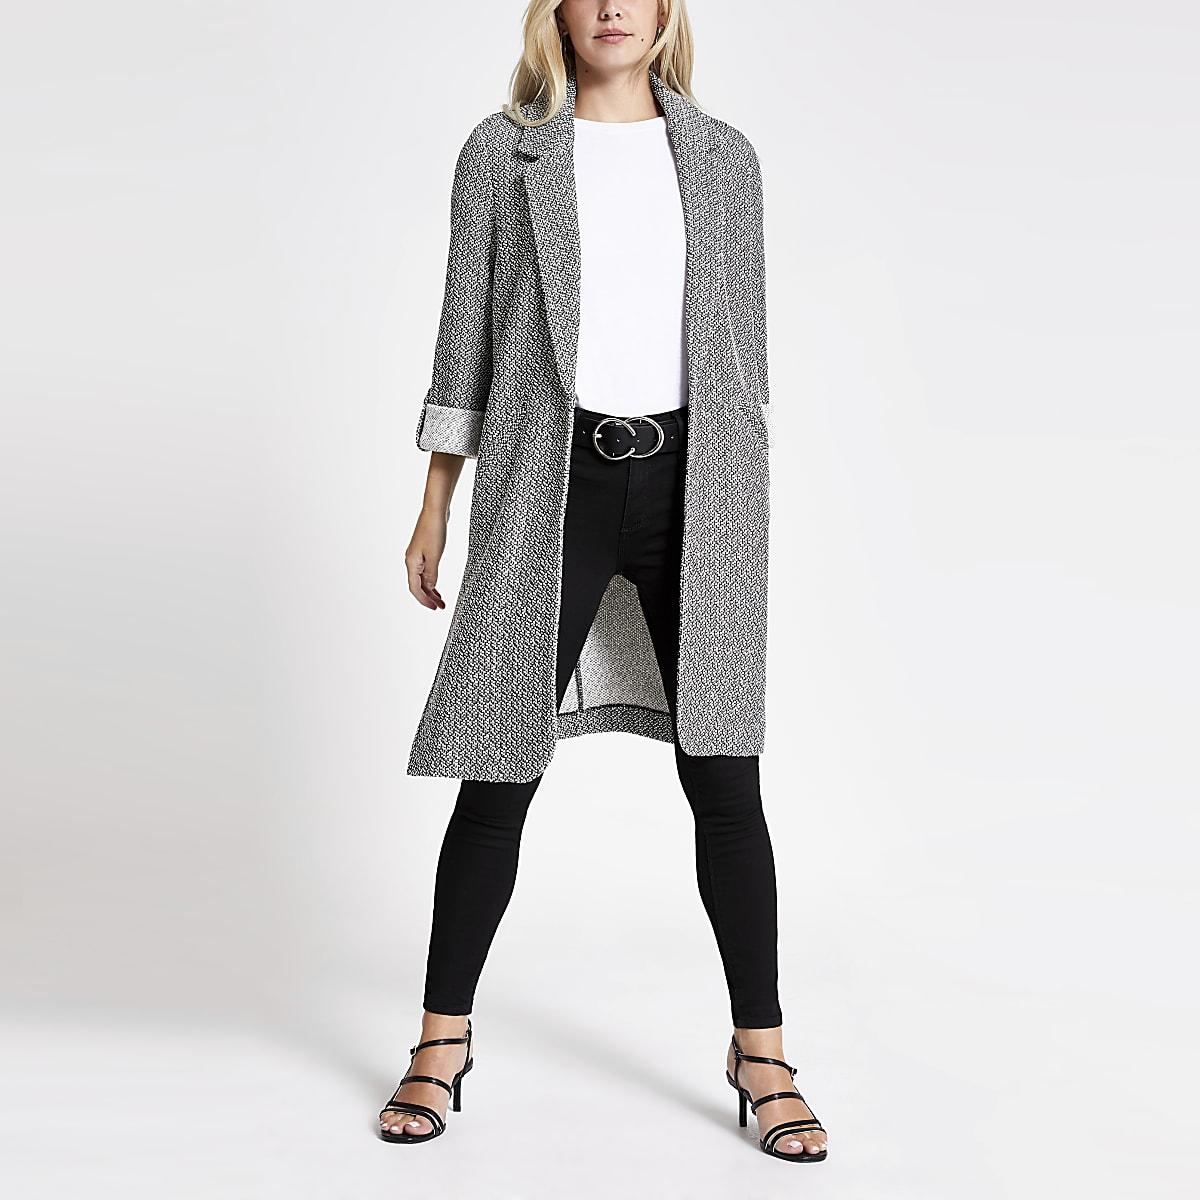 Petite black textured jersey duster jacket